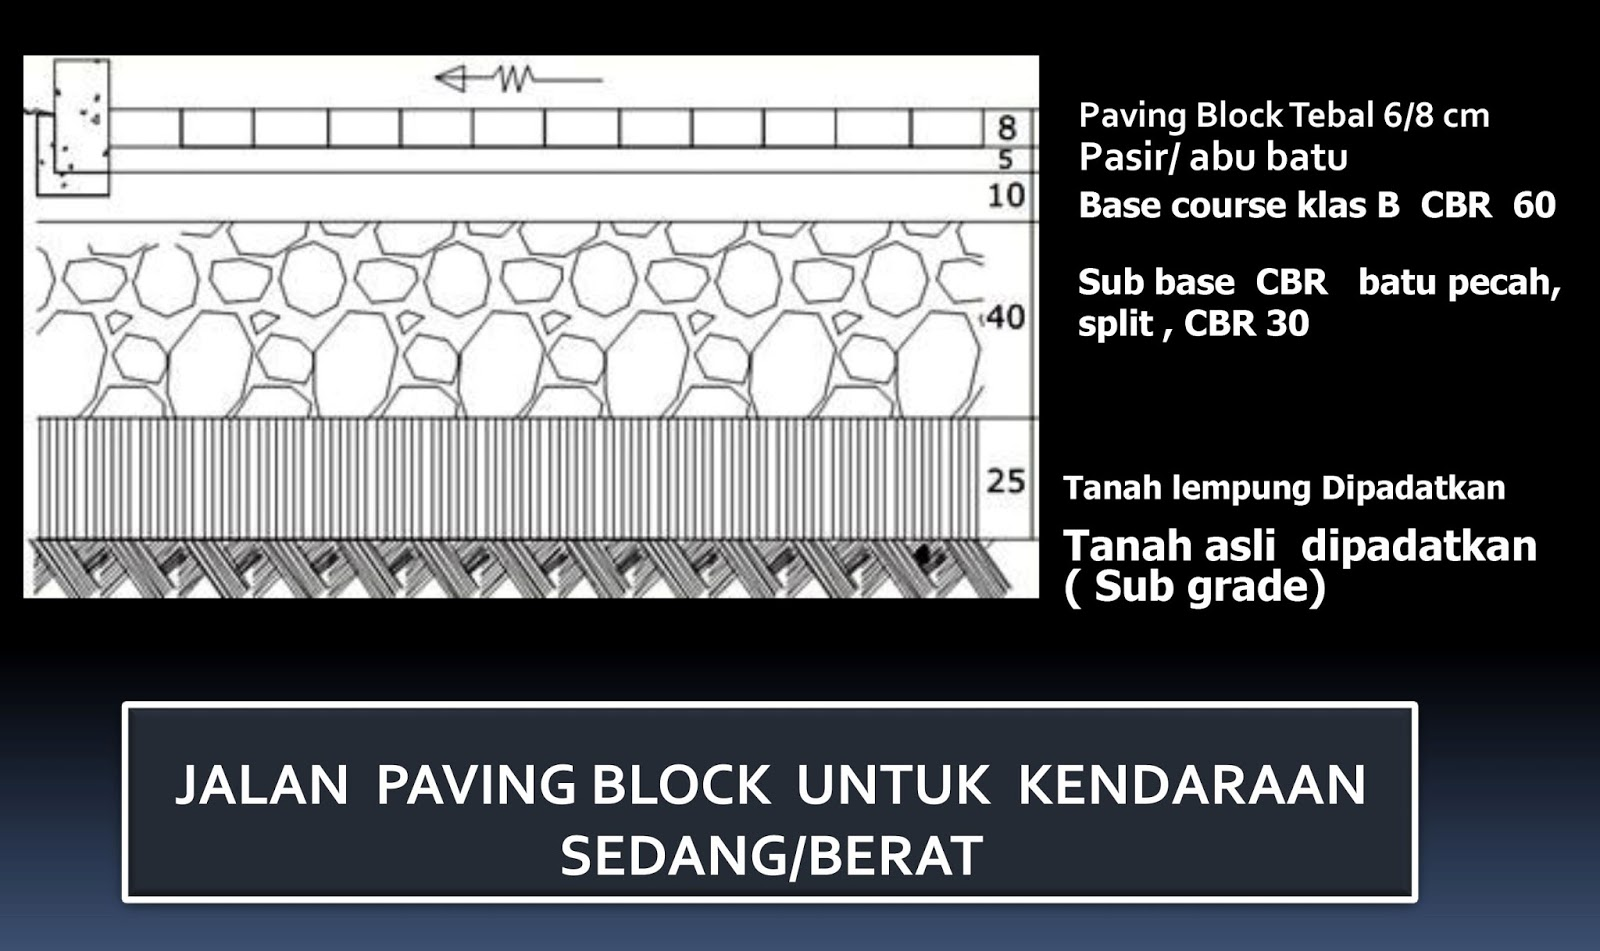 Mendisign konstruksi jalan Beton, Jalan aspal & jalan paving block serta perhitungan biayanya